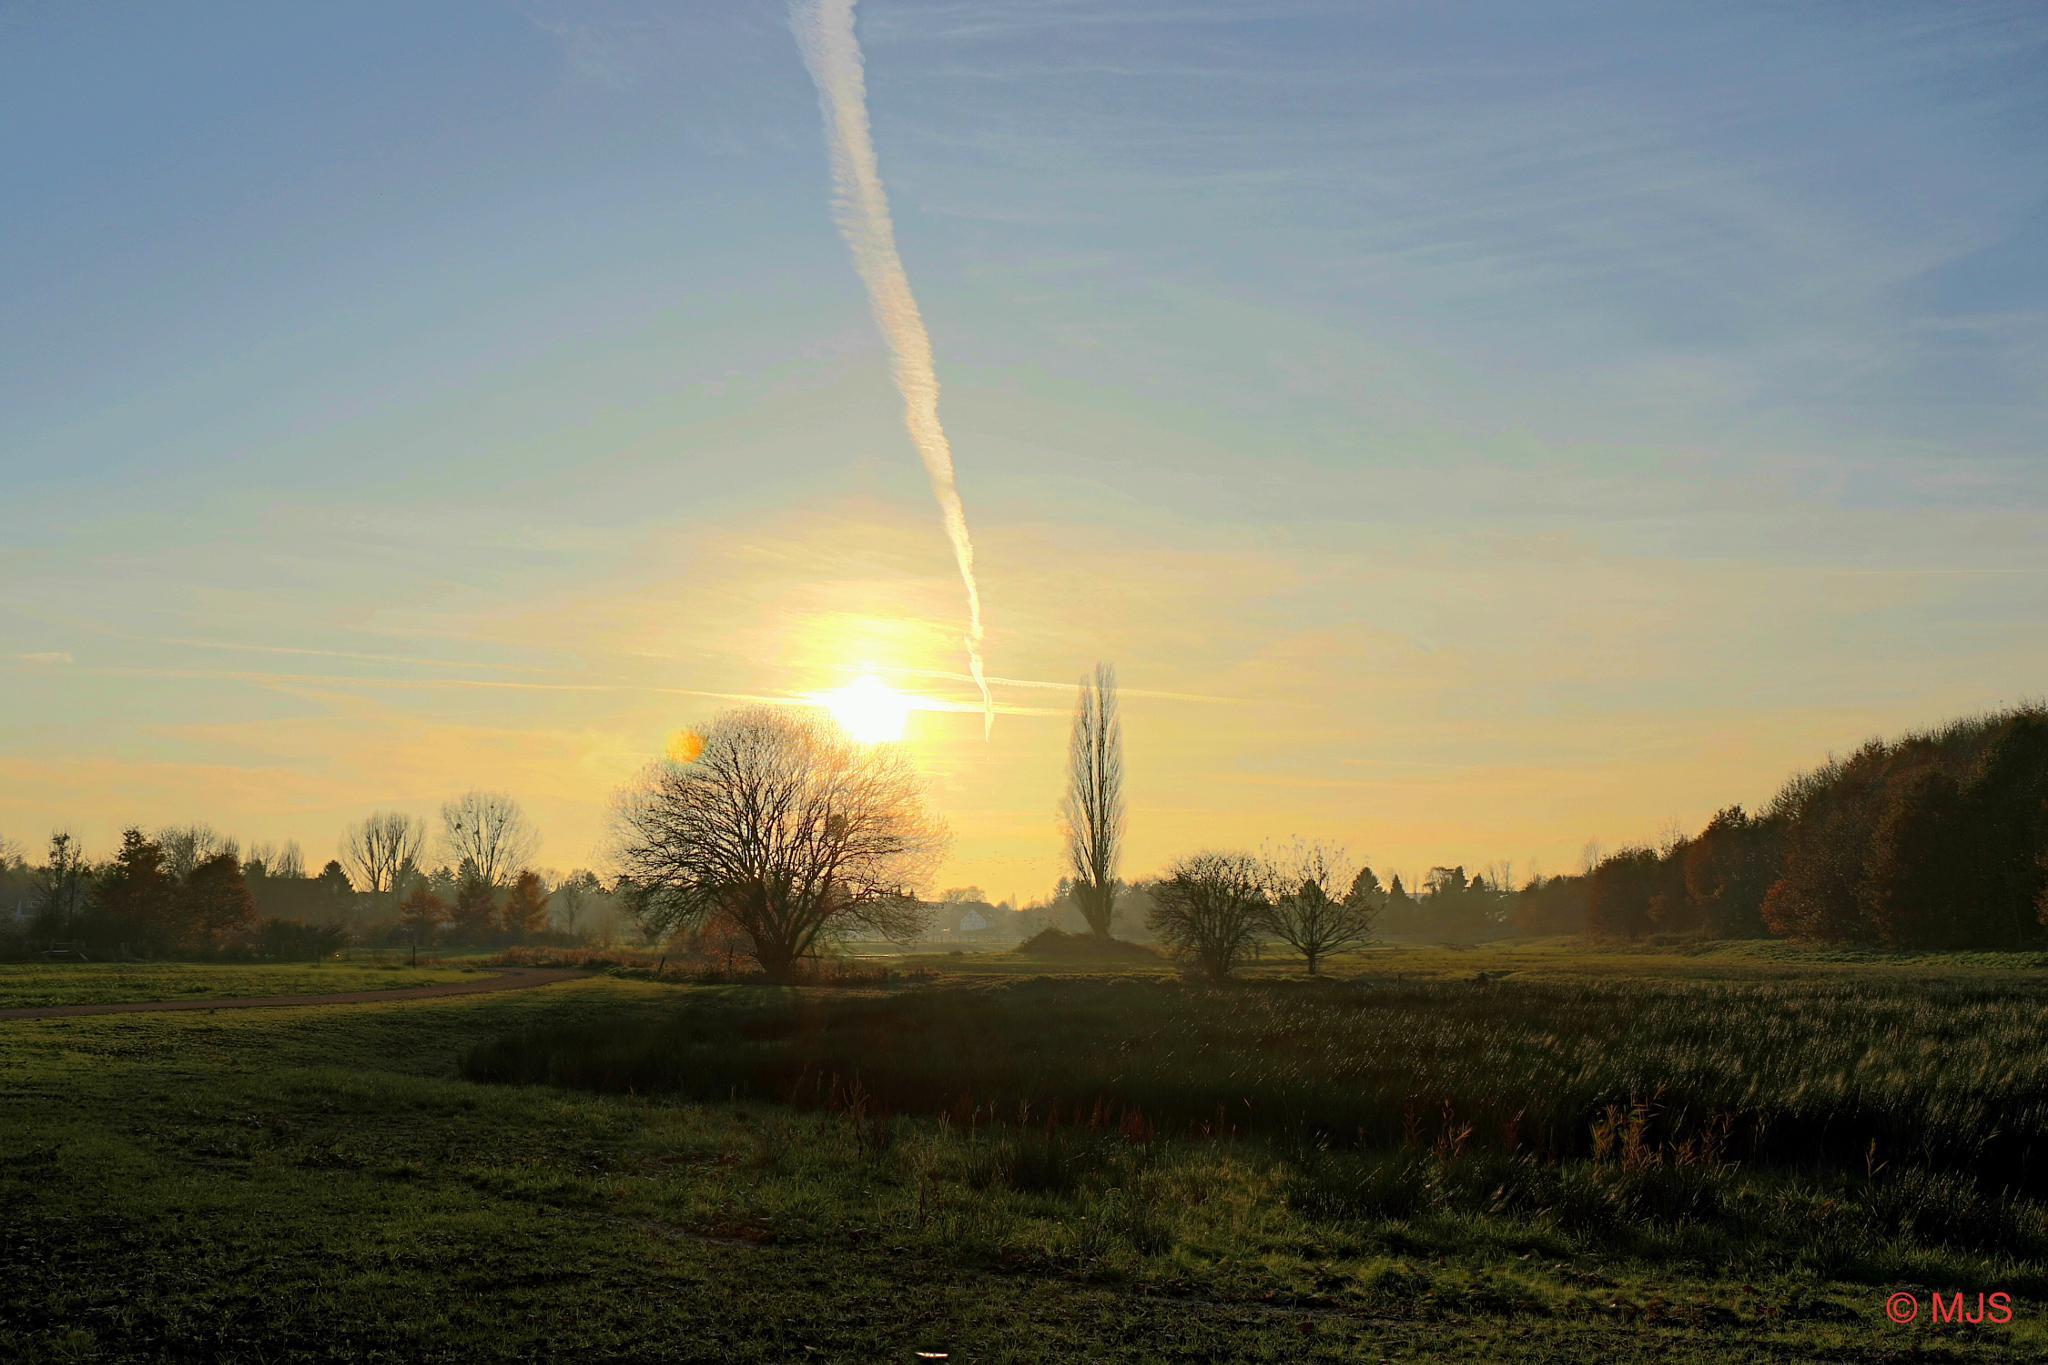 The Last sun by MJSMarcJoern